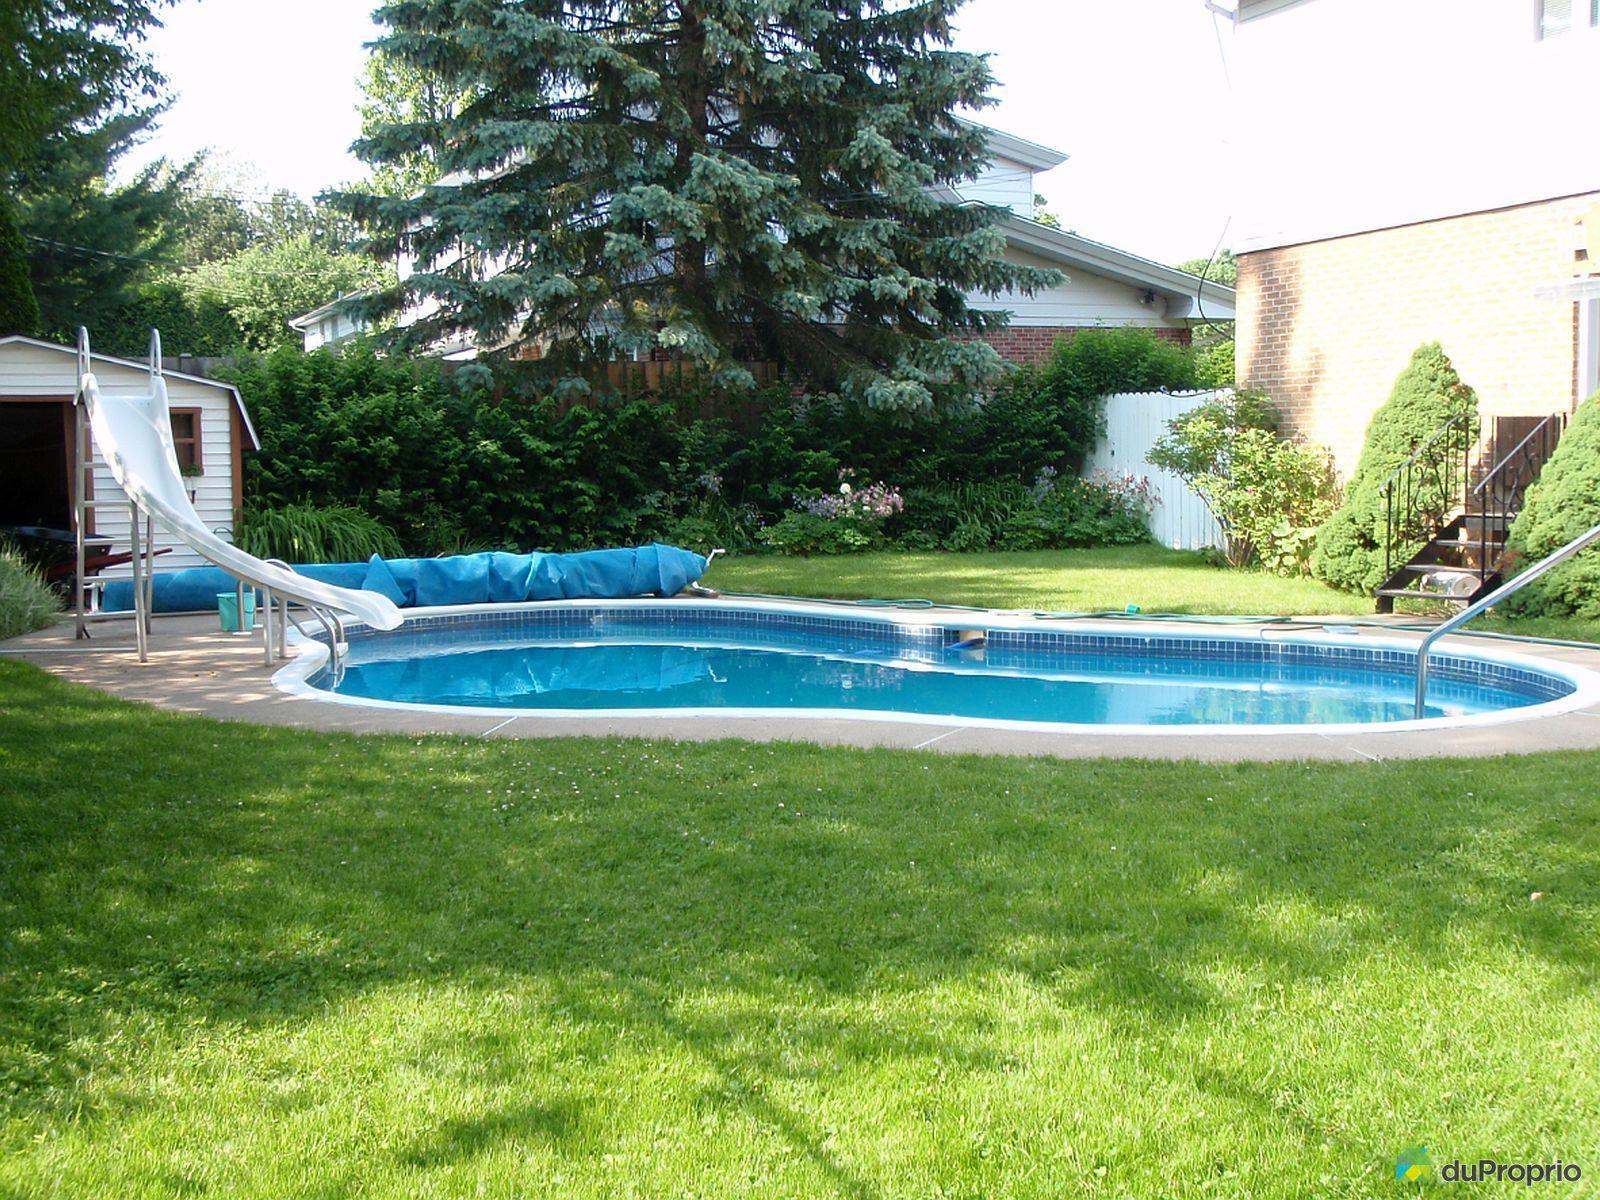 Maison vendre montr al 44 chemin highridge immobilier for Cout piscine creusee